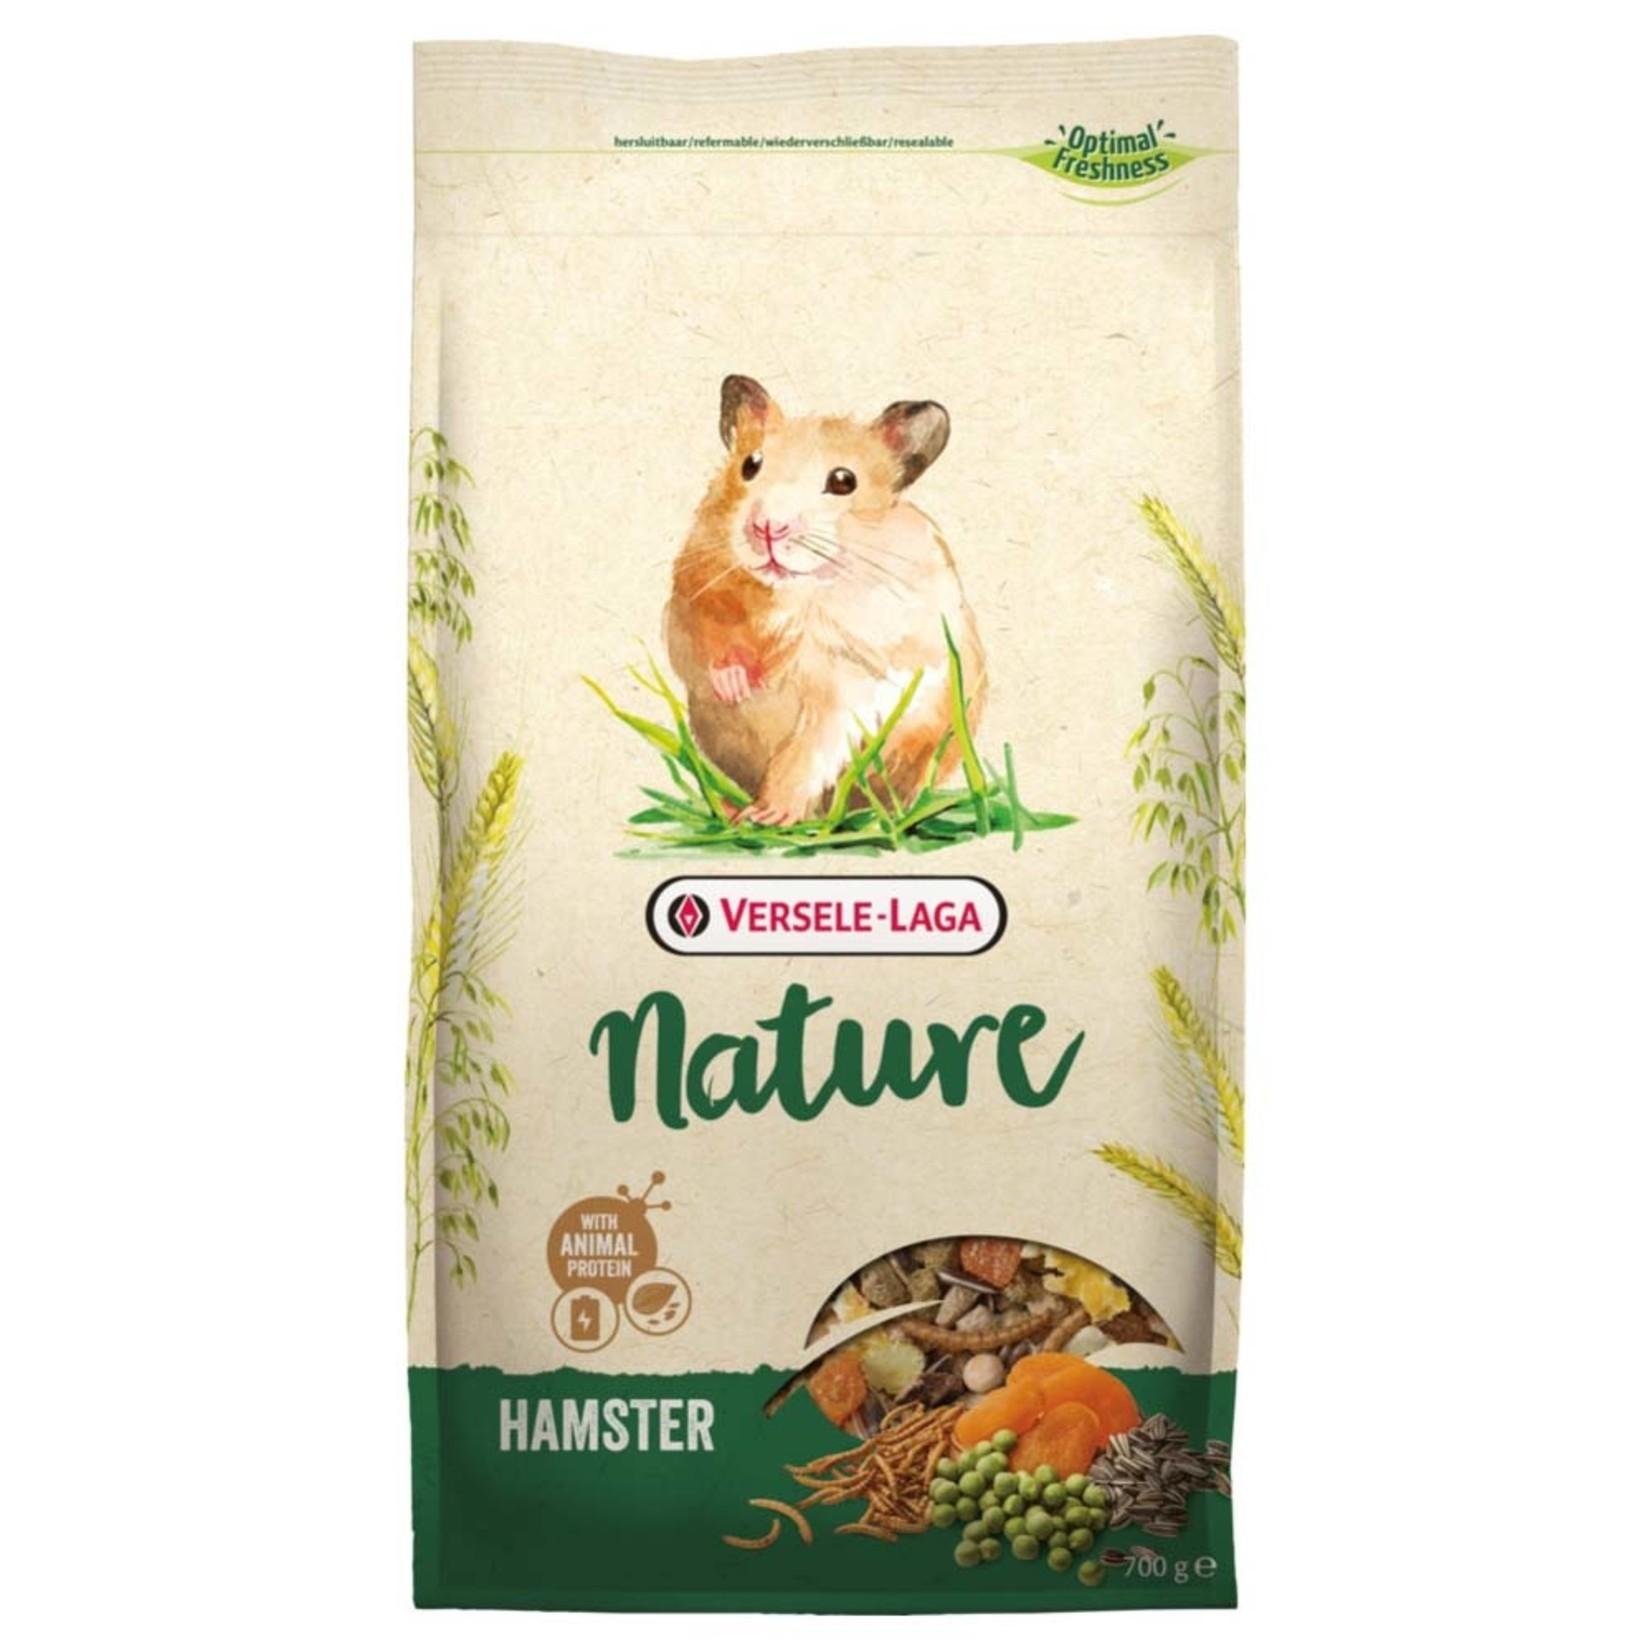 Versele-Laga Nature Hamster Food 700g